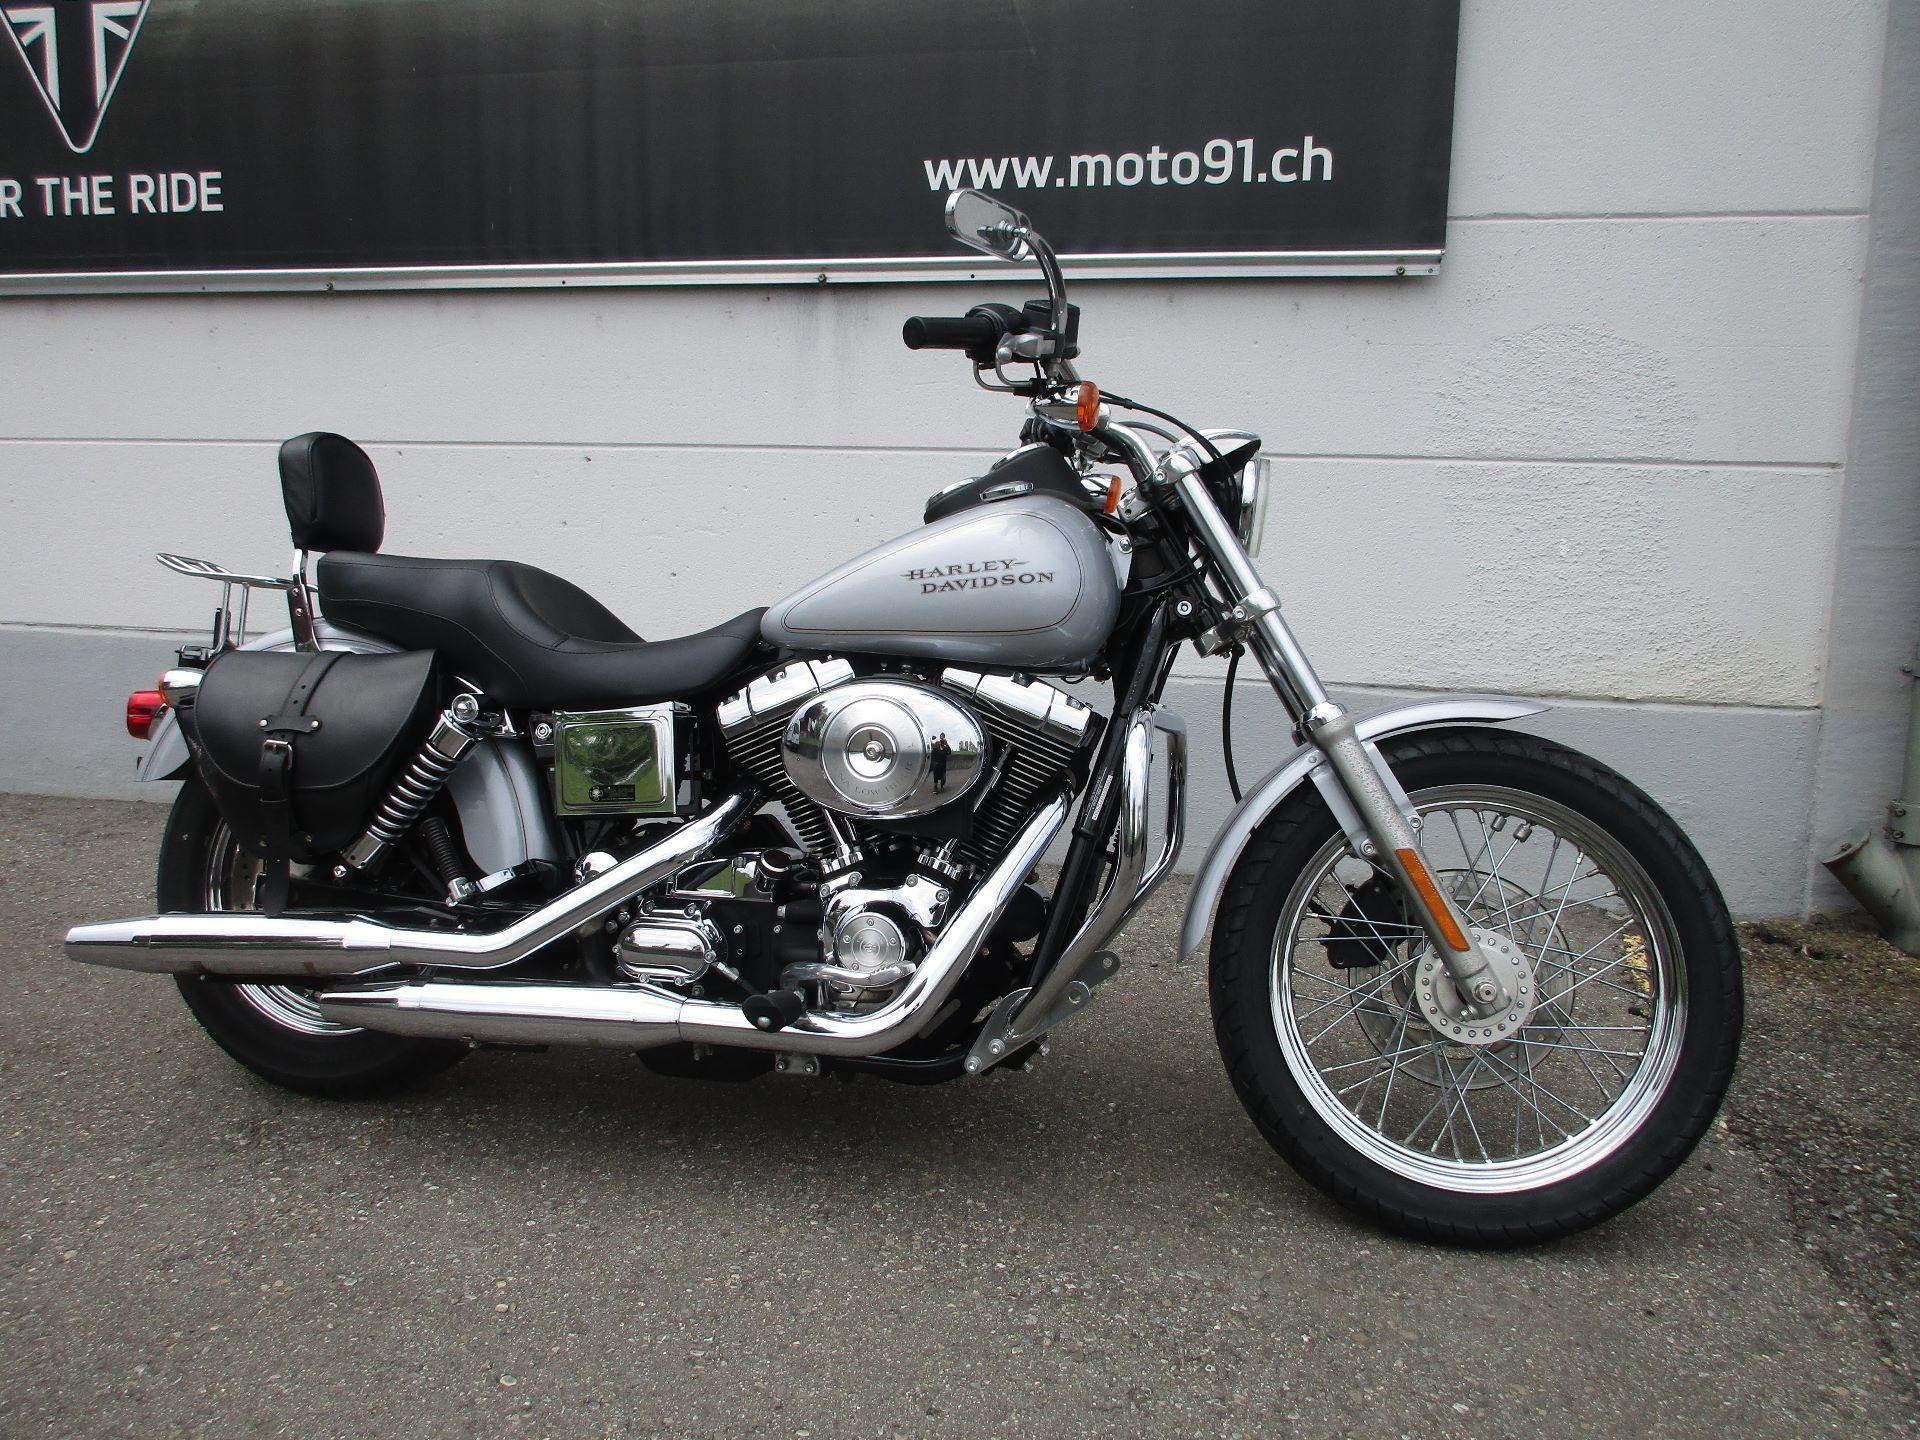 moto occasions acheter harley davidson fxdl 1450 dyna low rider custom moto 91 ag h ri. Black Bedroom Furniture Sets. Home Design Ideas